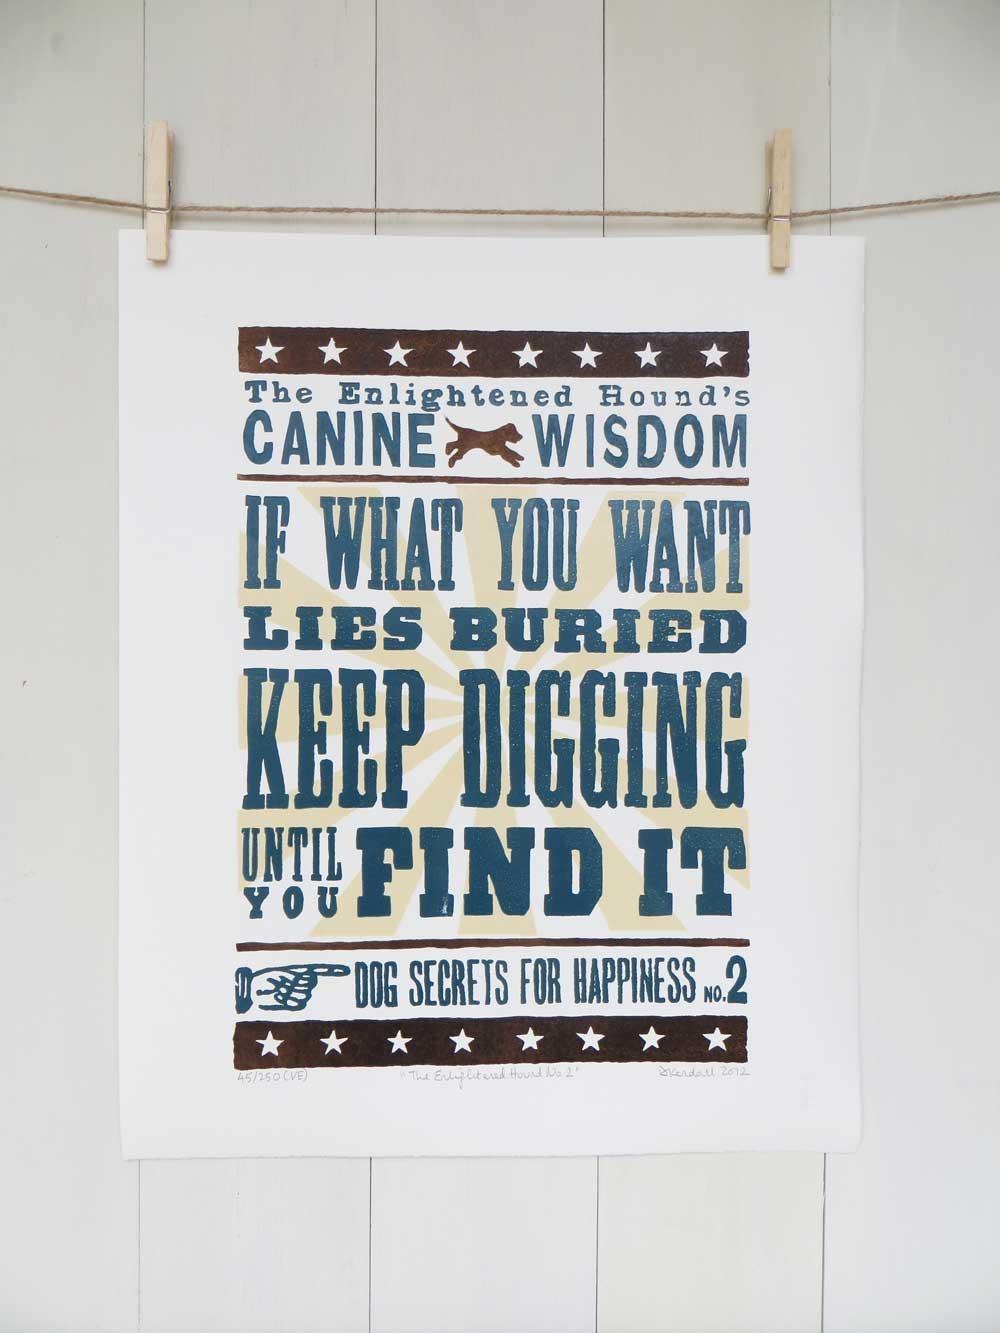 Inspirational Dog Sayings For Life: Original Word Art Print No2 Pertaining To Dog Sayings Wall Art (View 17 of 20)